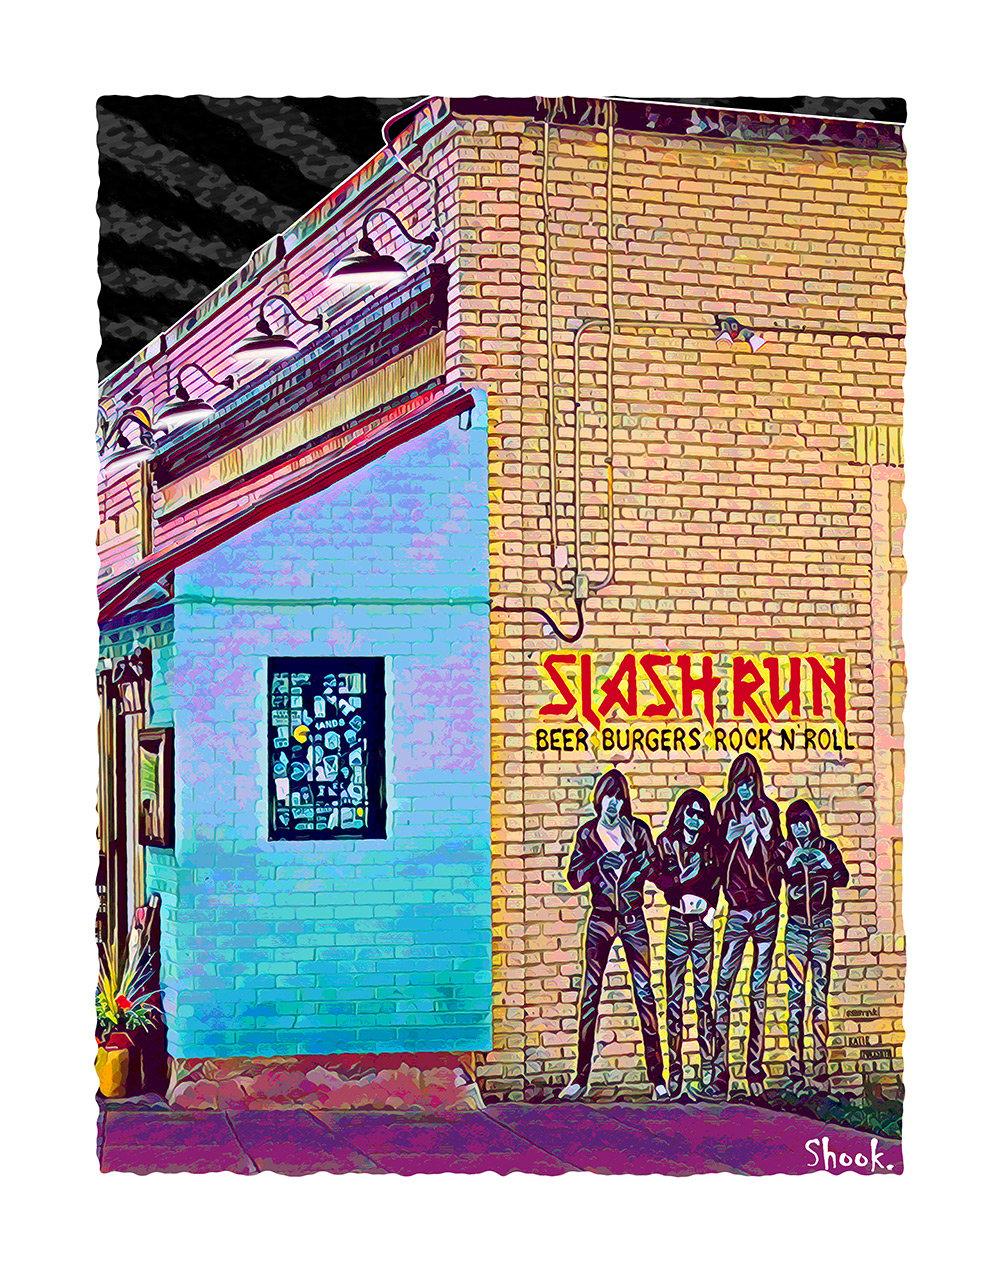 Slash Run, Washington DC Giclée Art Print (Multi-size options)